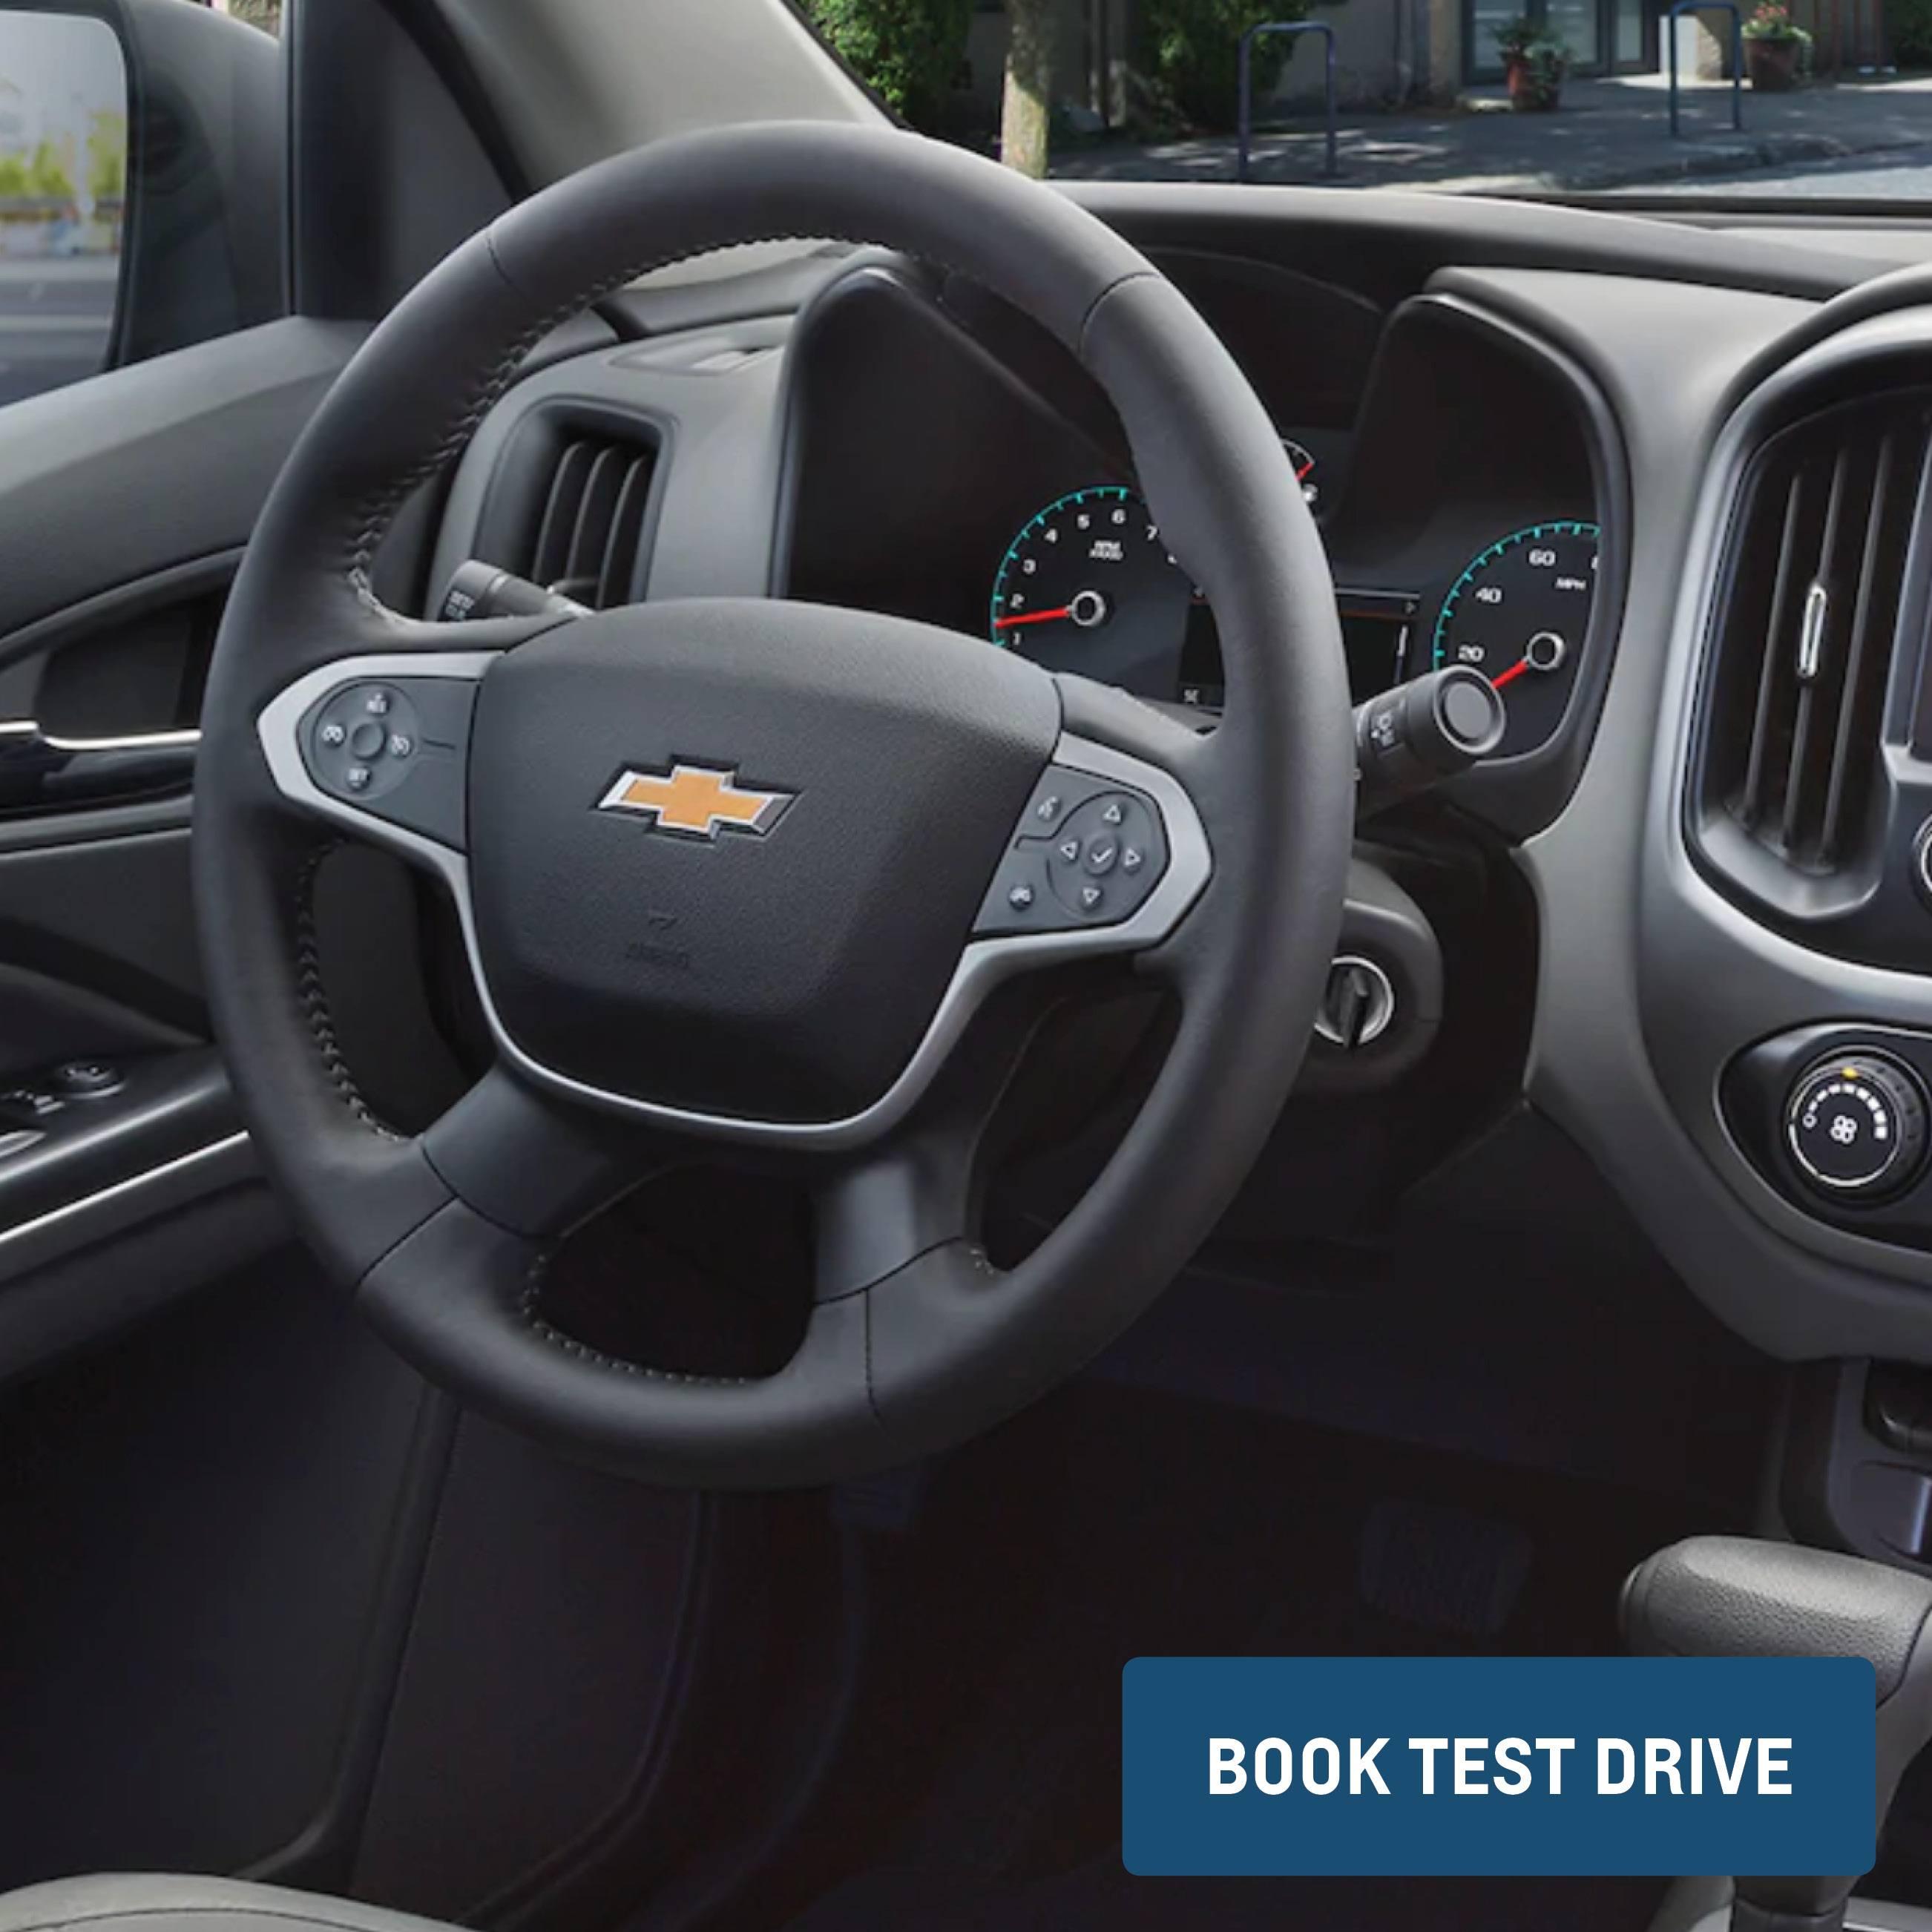 Book Test Drive